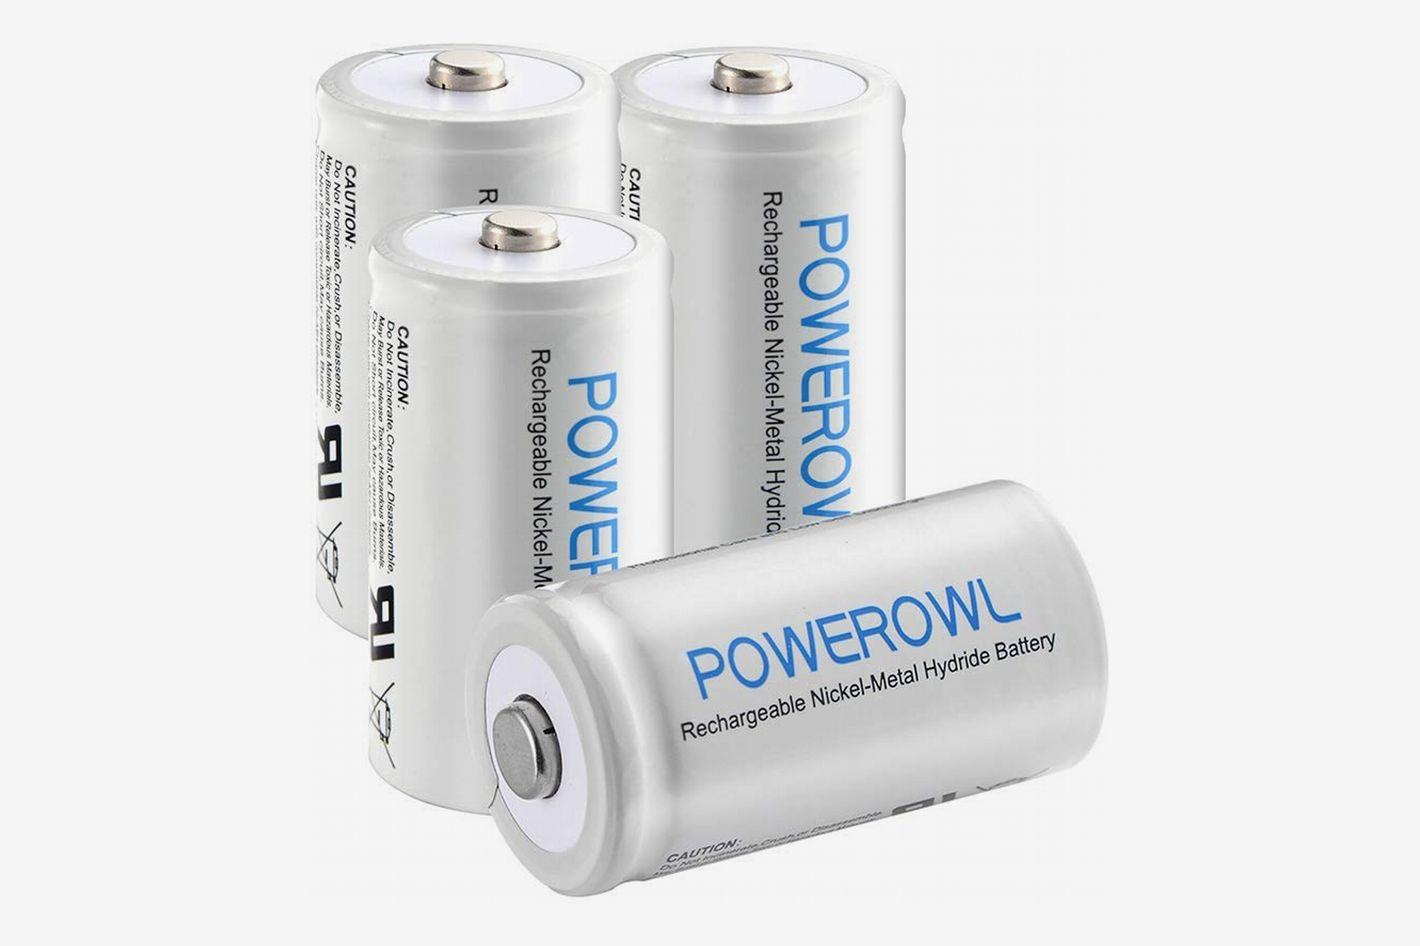 POWEROWL D Size Rechargeable Batteries (4-Pack)